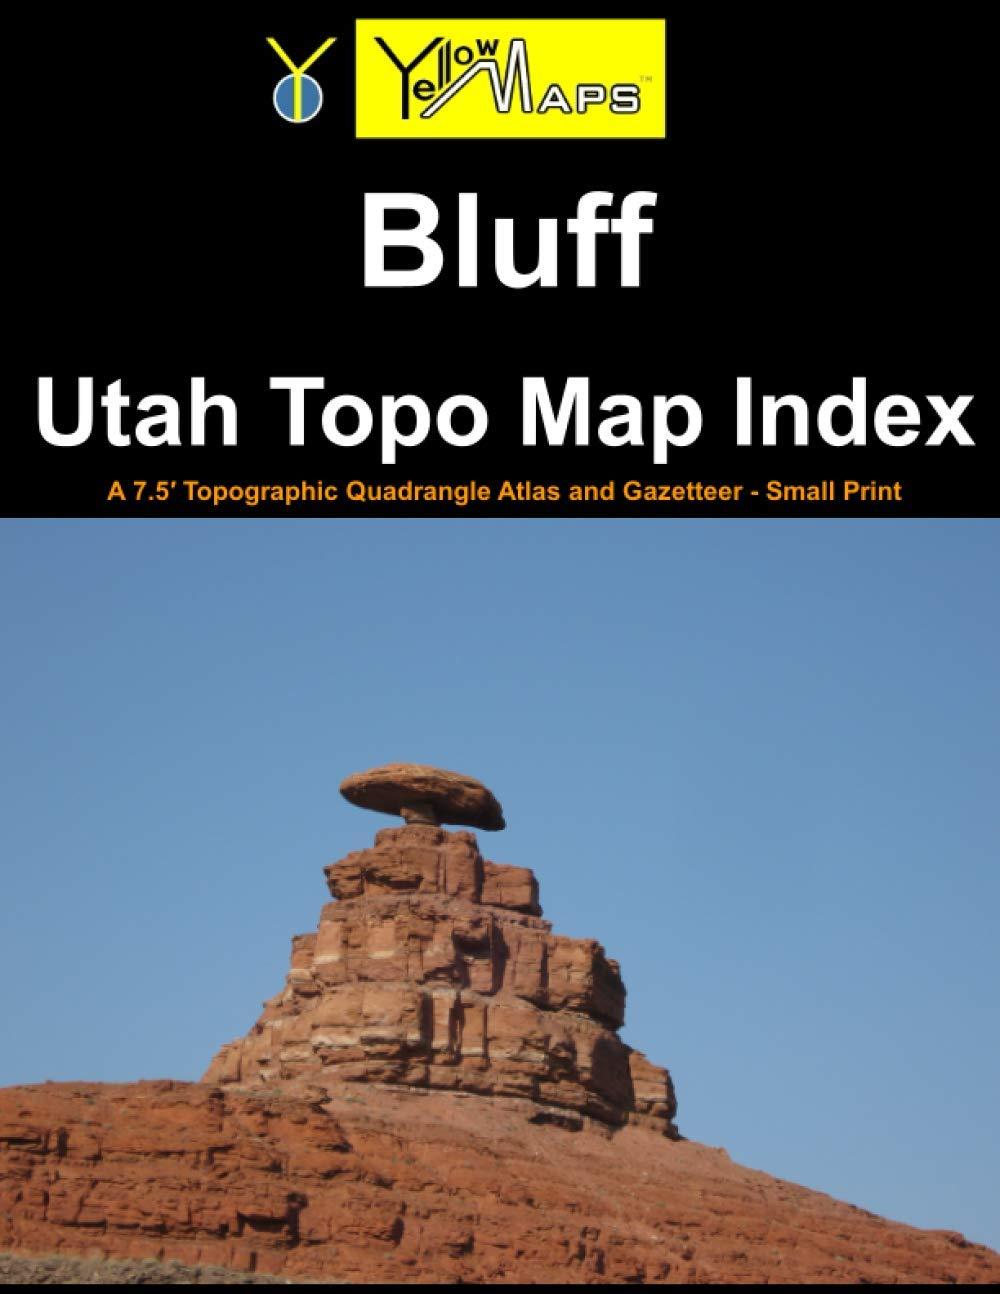 Paperback atlas: Bluff Utah Topo Map Index